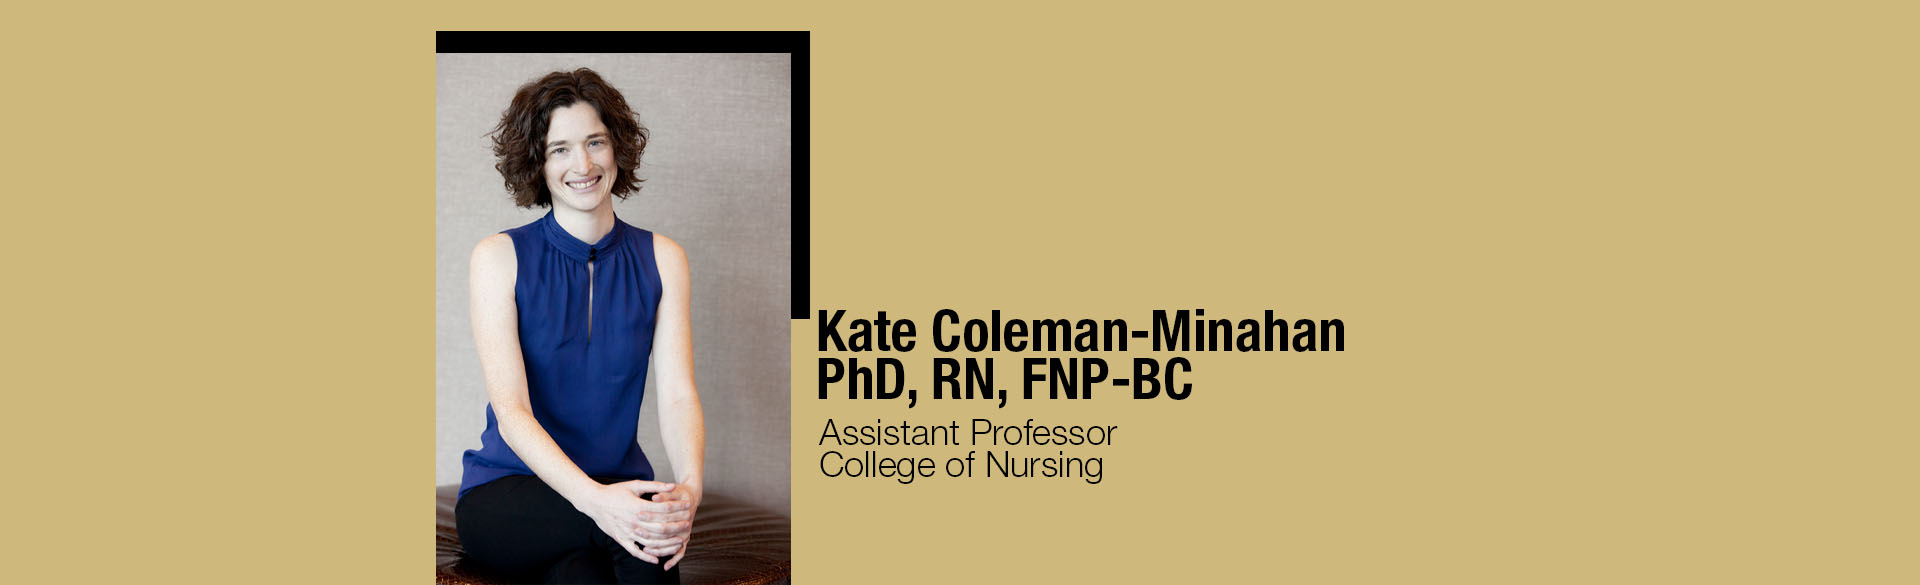 CU Assistant Professor Kate Coleman-Minahan